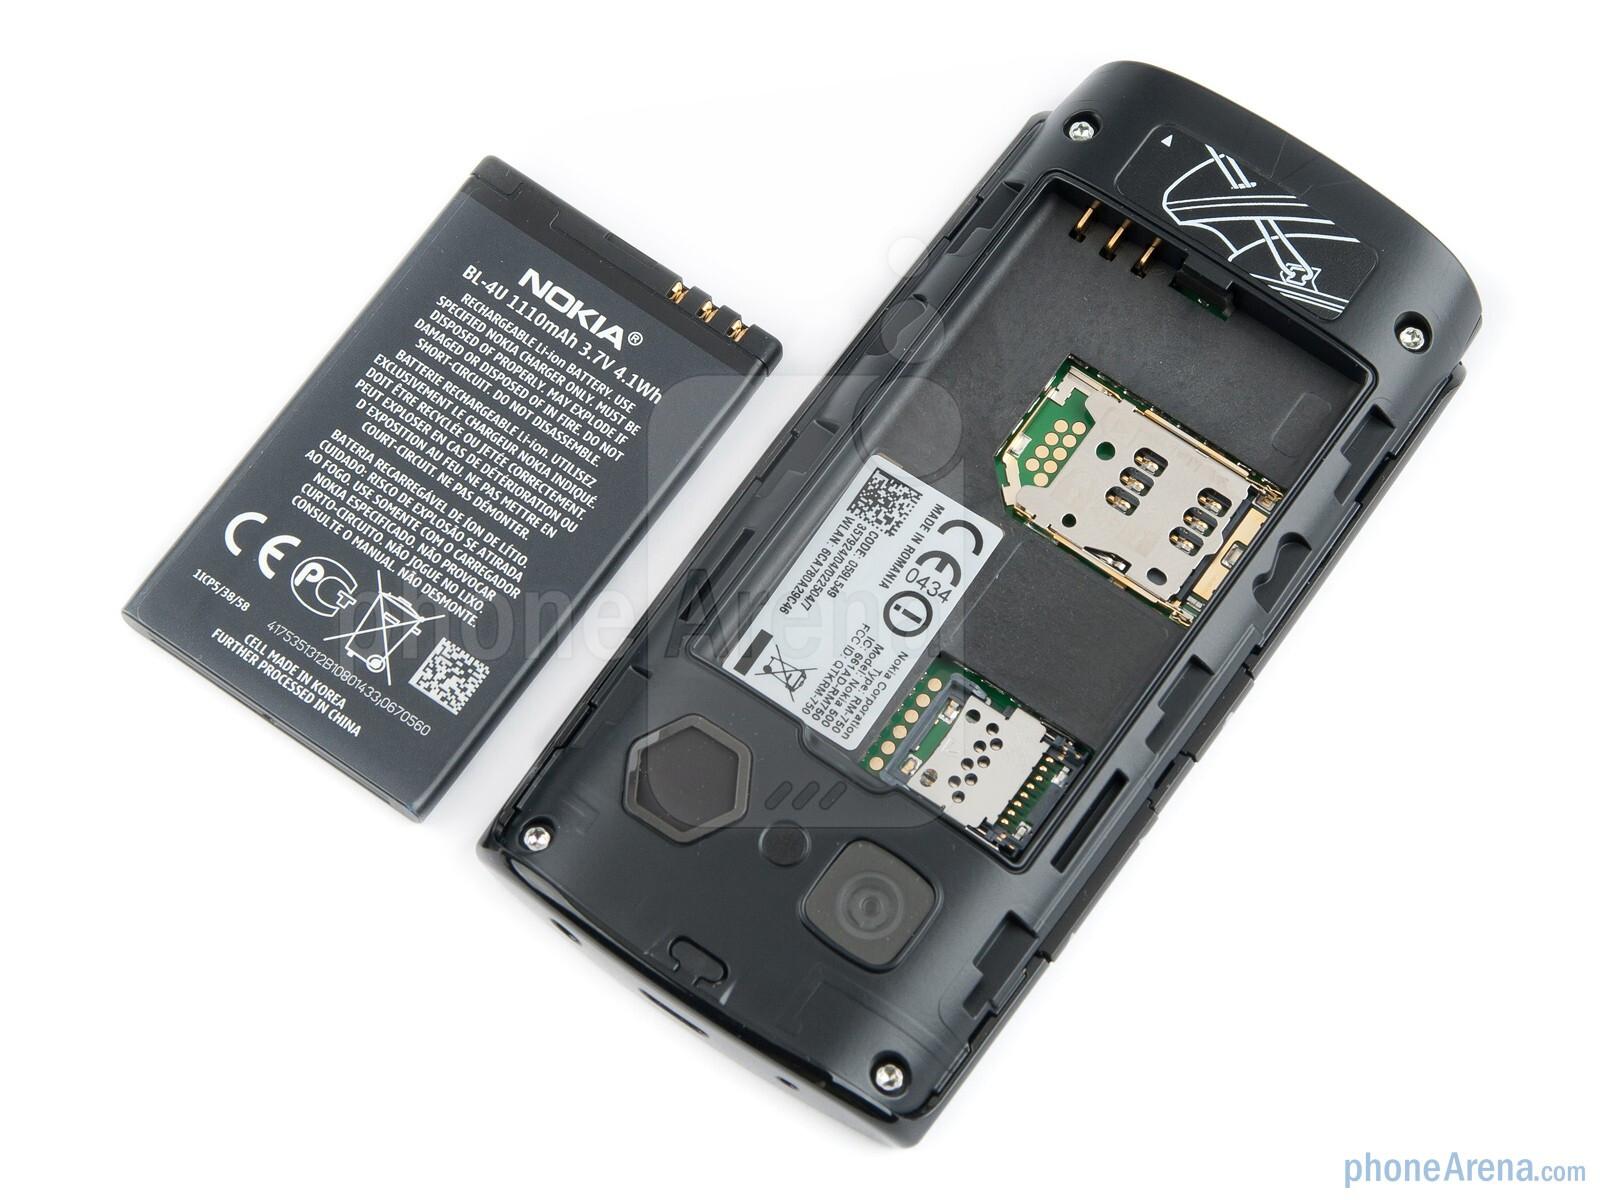 Nokia 500 Pdf Reader